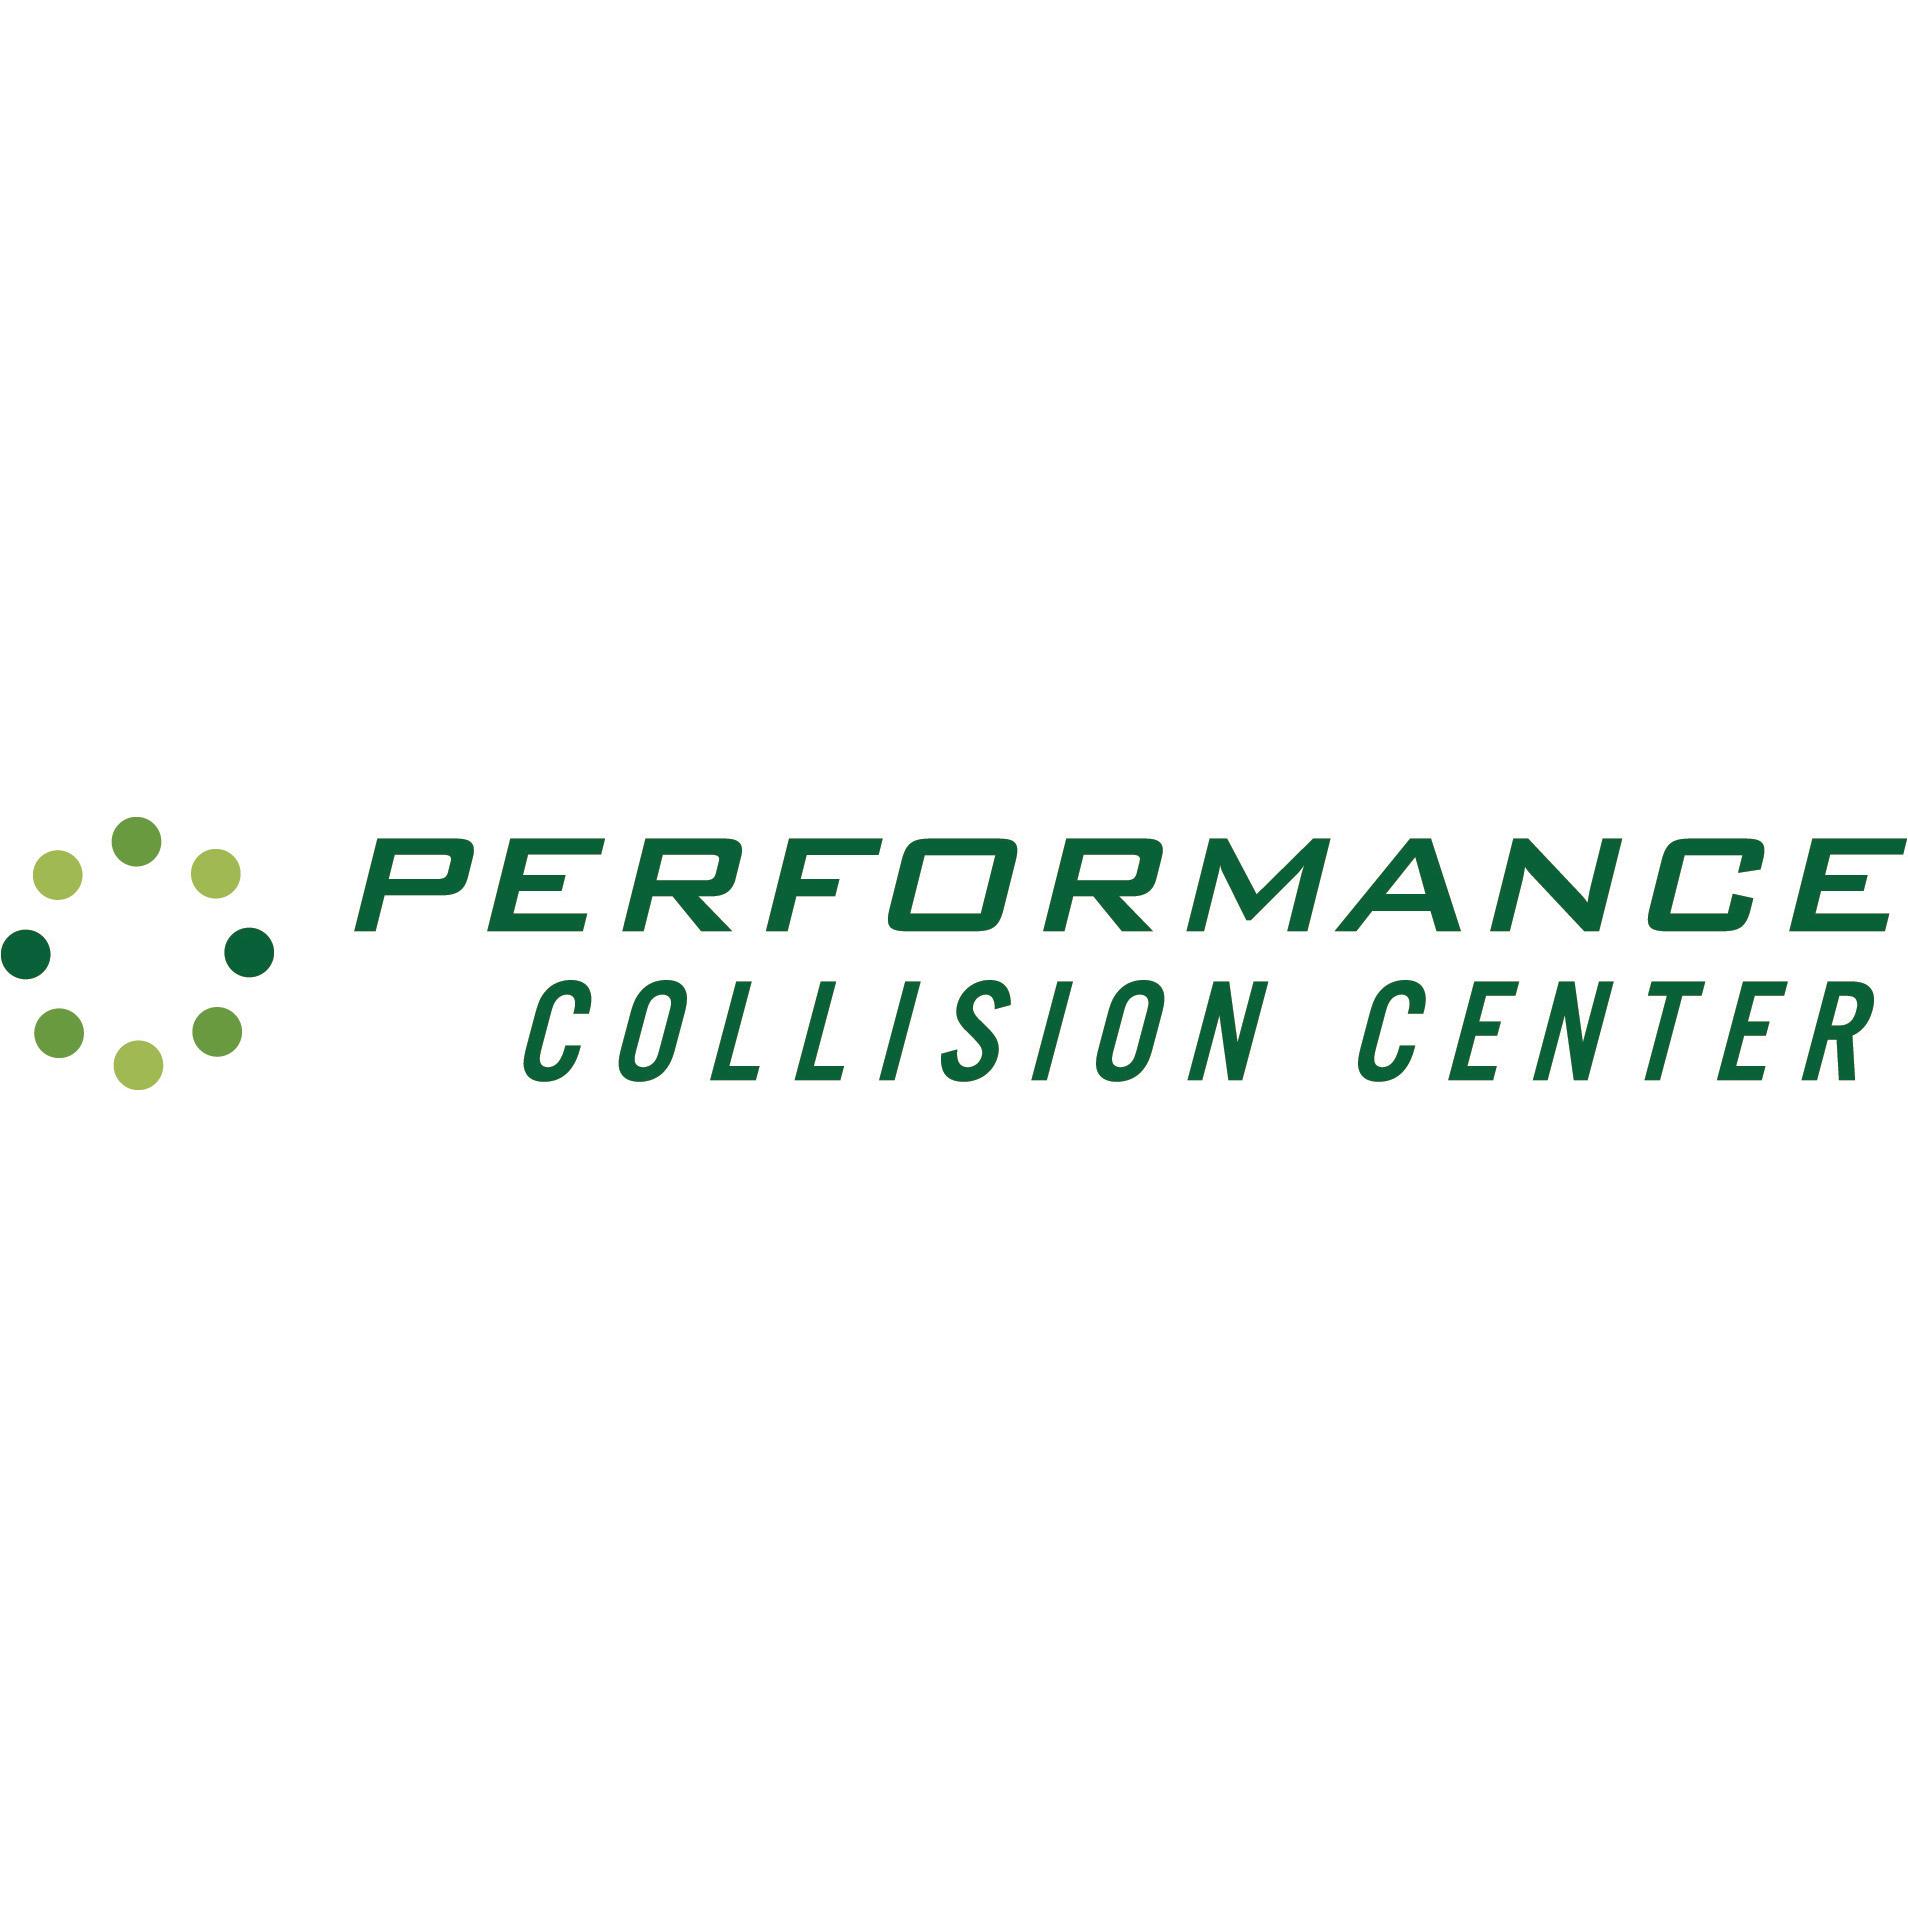 Performance Collision Center